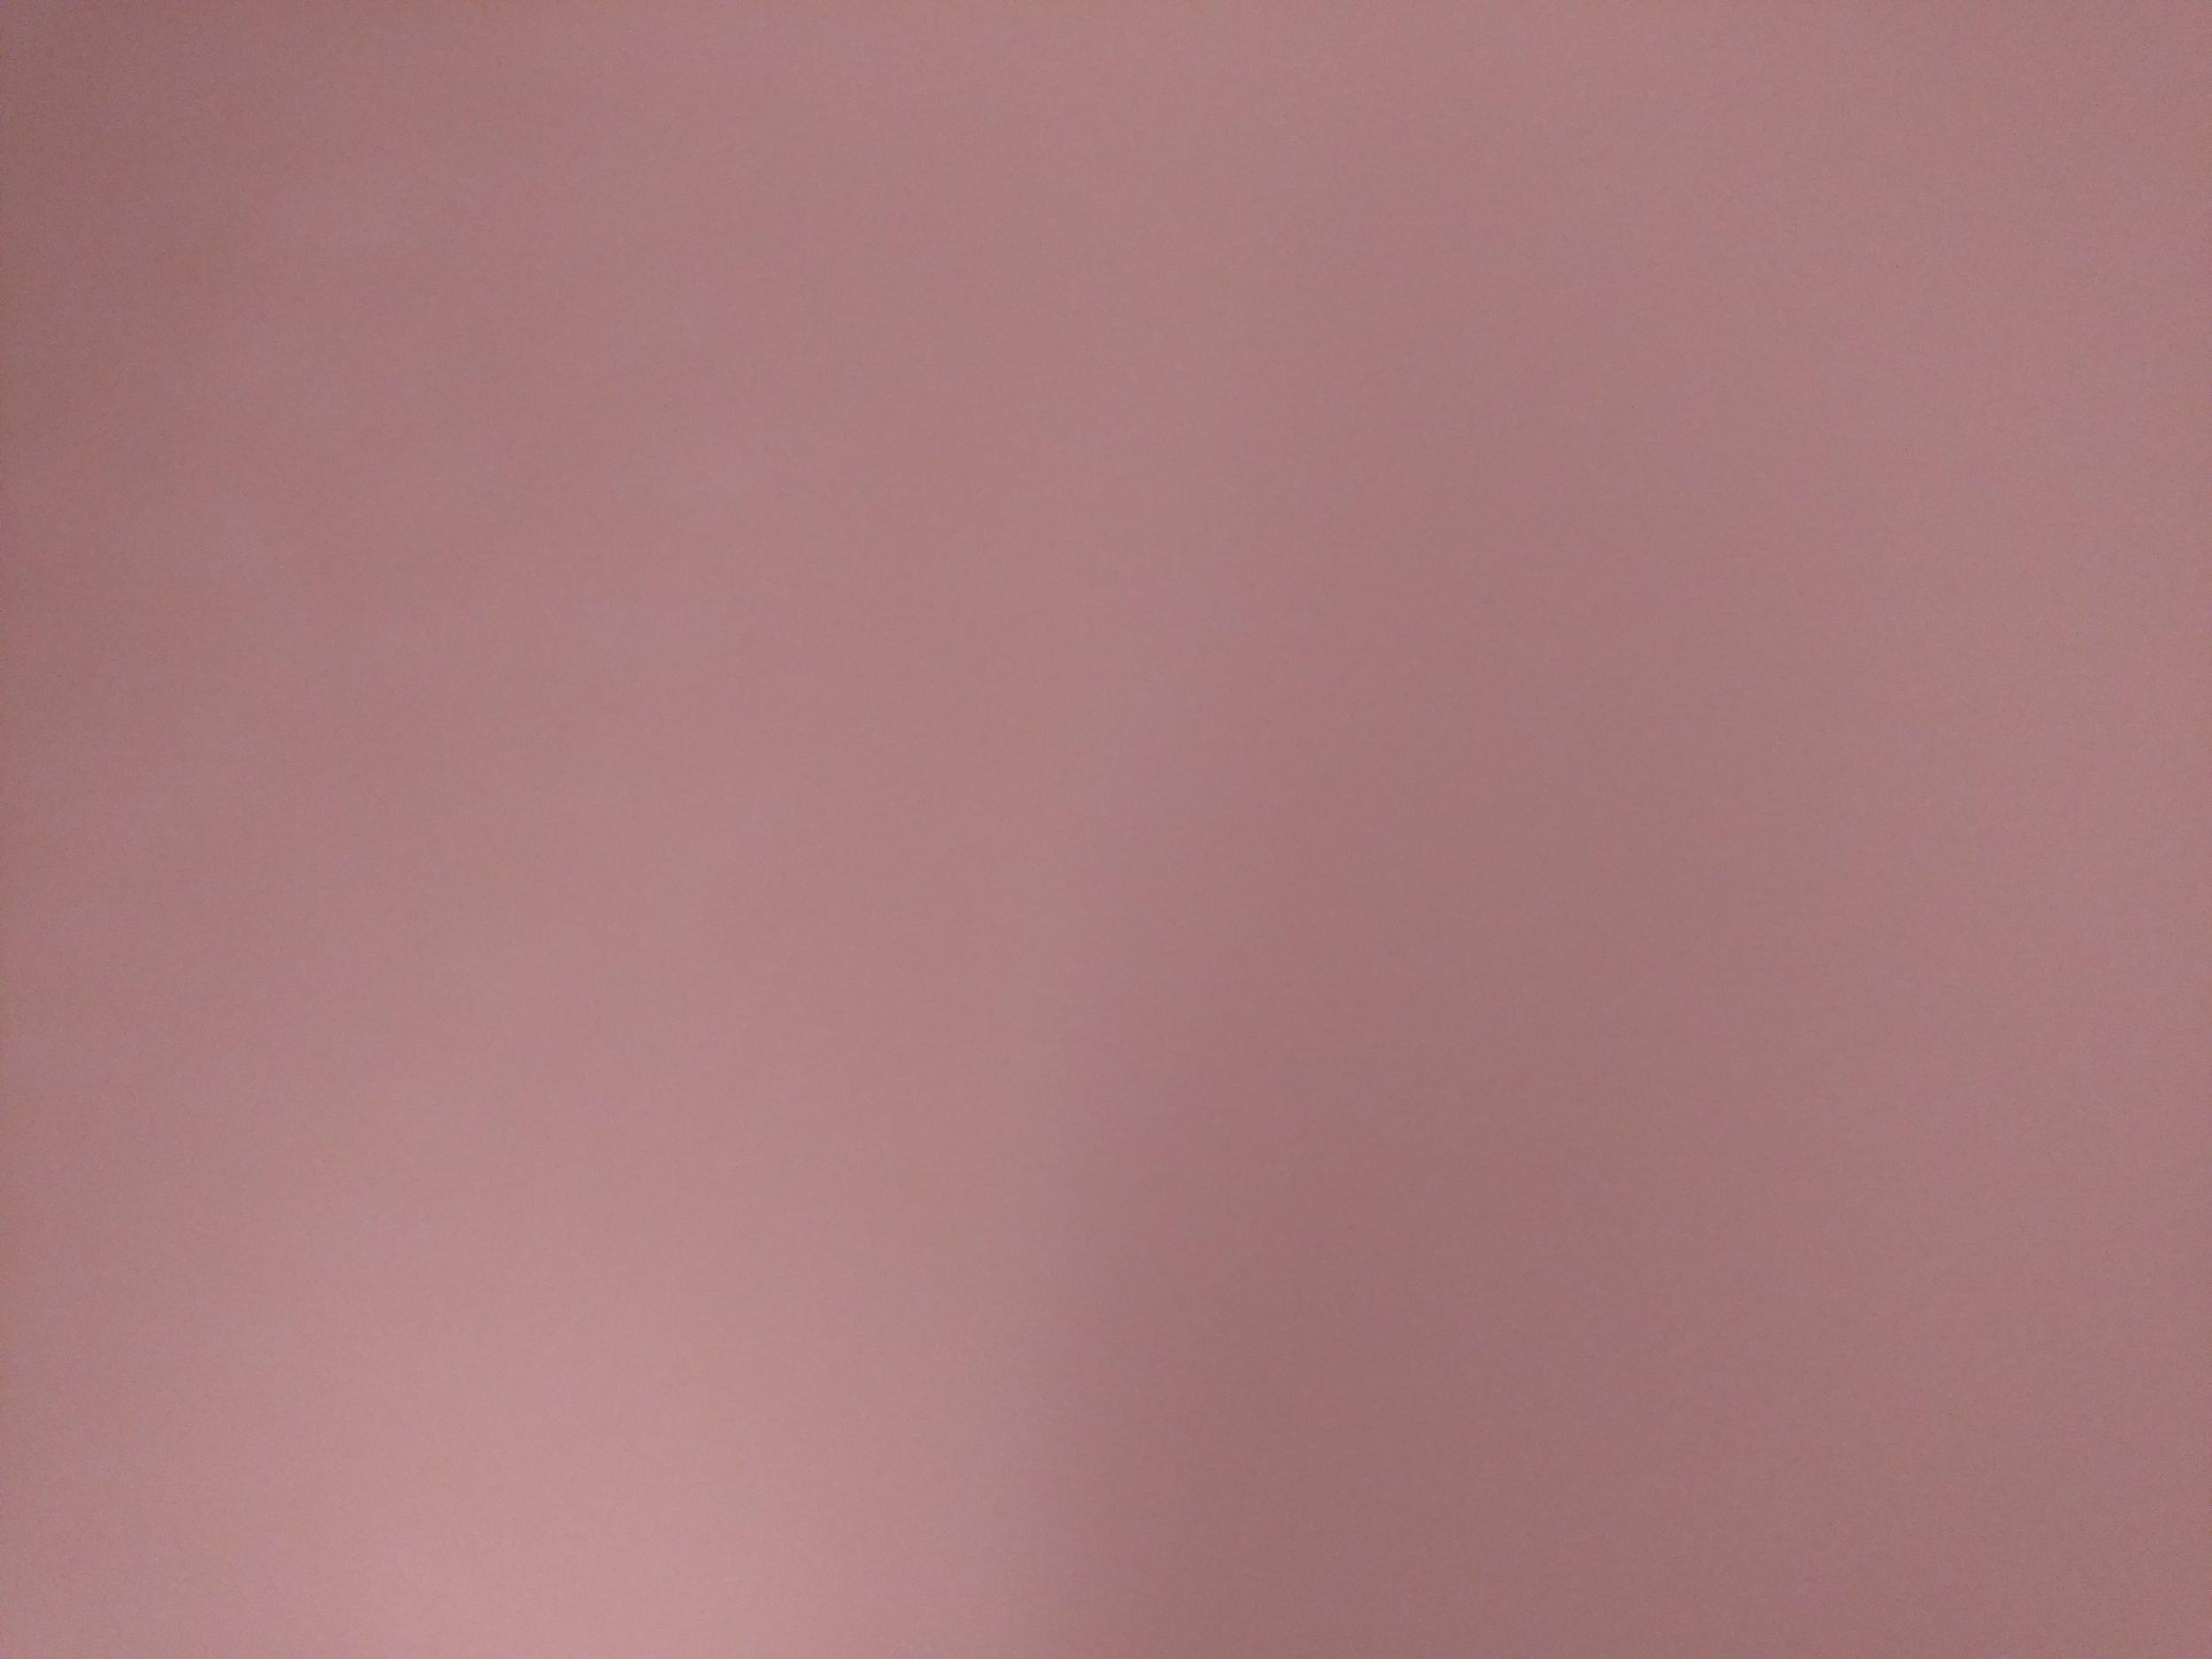 willroth-co-free-texture-gradient-021.jpg